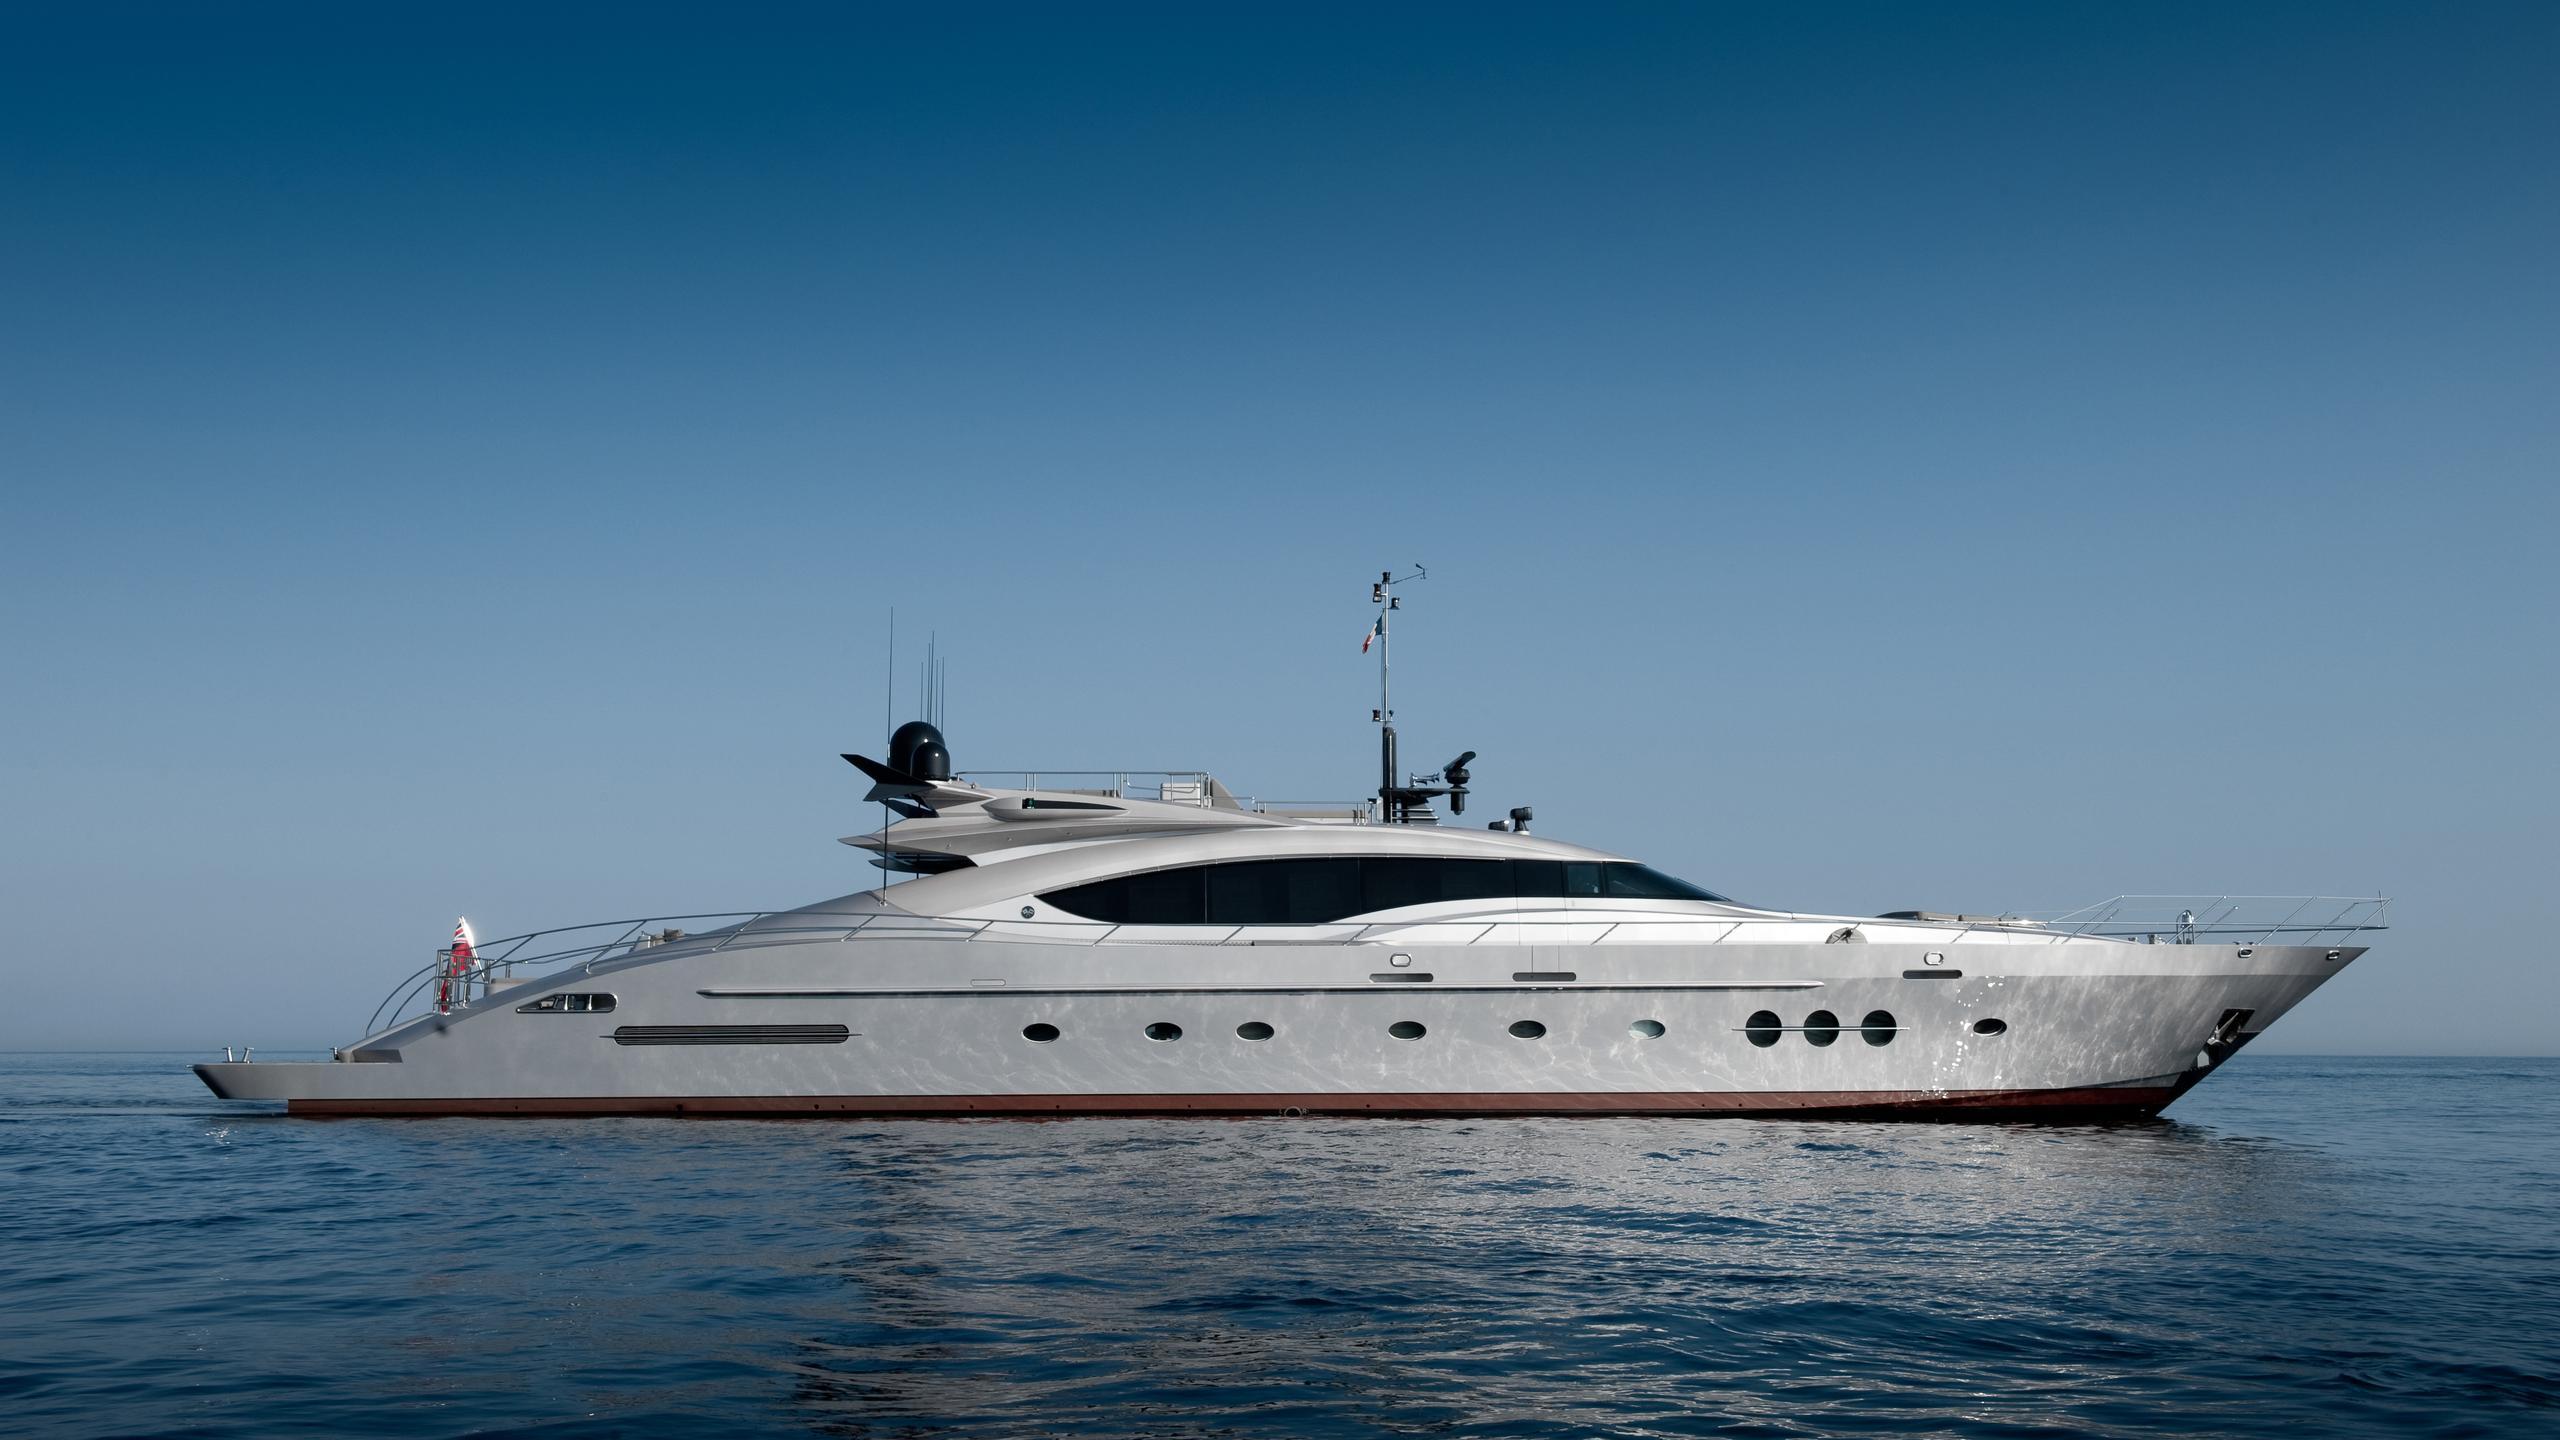 izumi-motor-yacht-palmer-johnson-120-my-2008-37m-profile